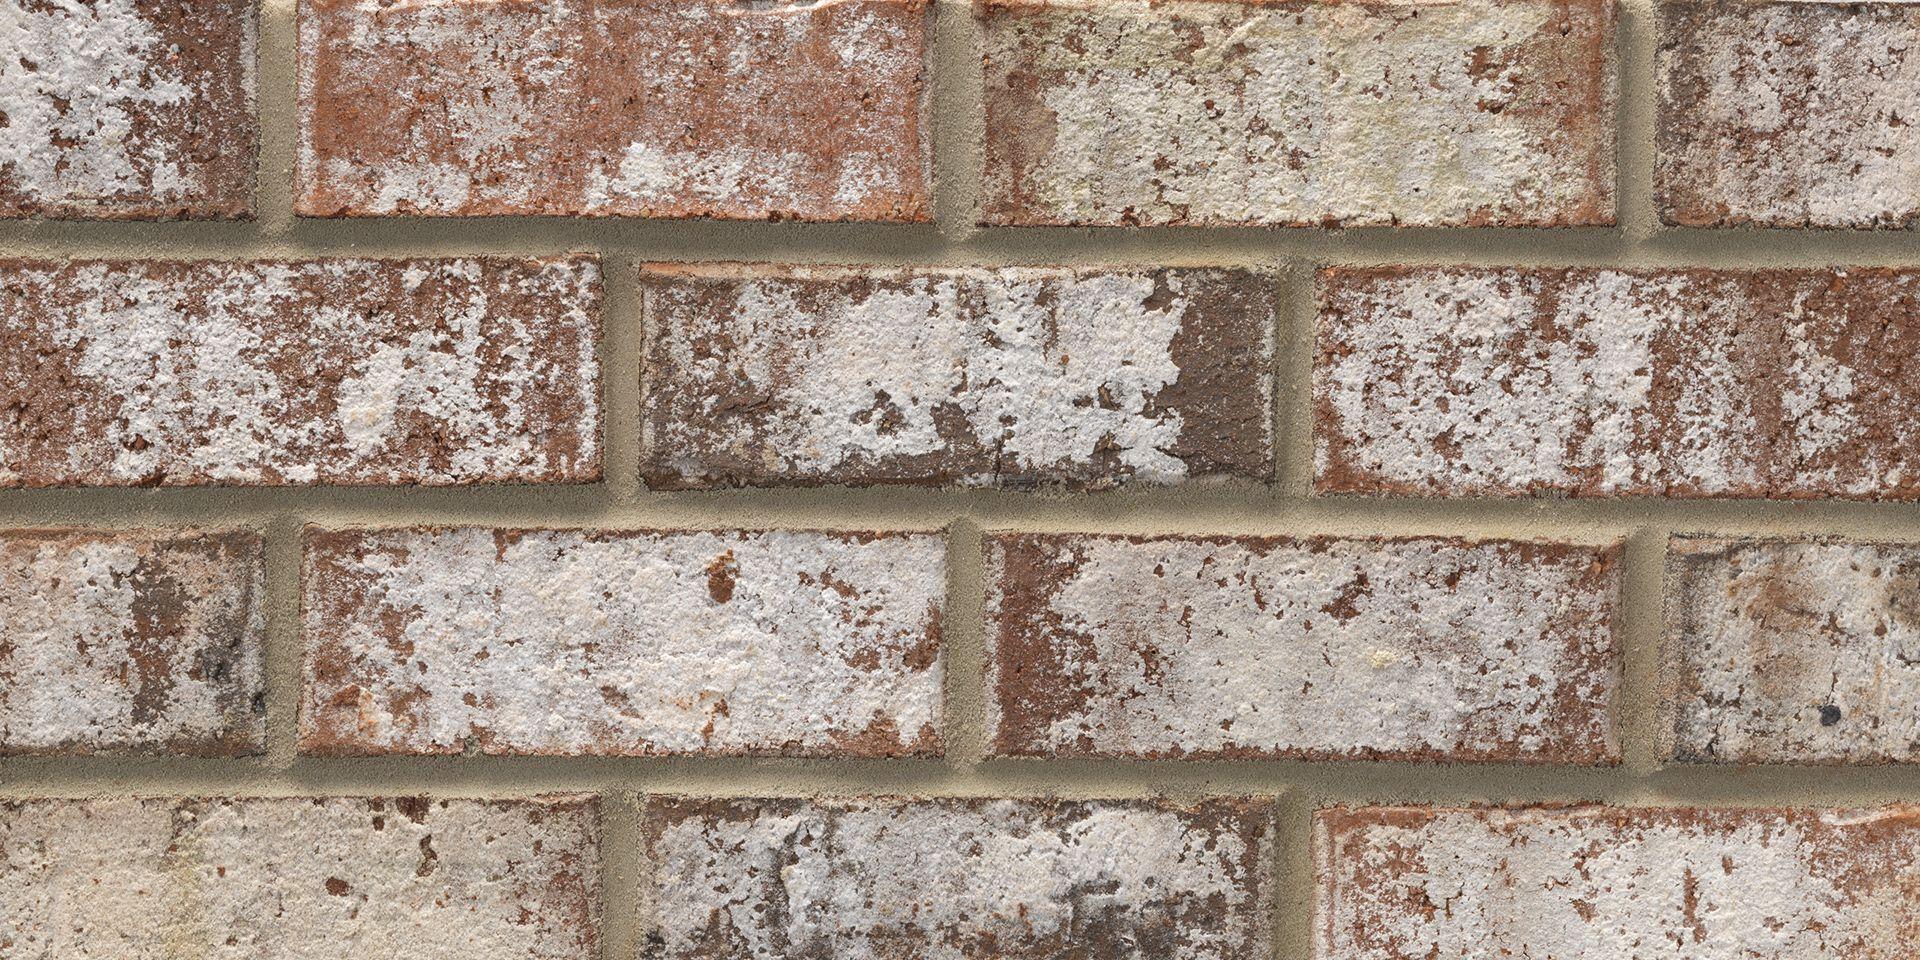 Acme Brick Tile And Stone Brickcom Aspen Brick House In 2019